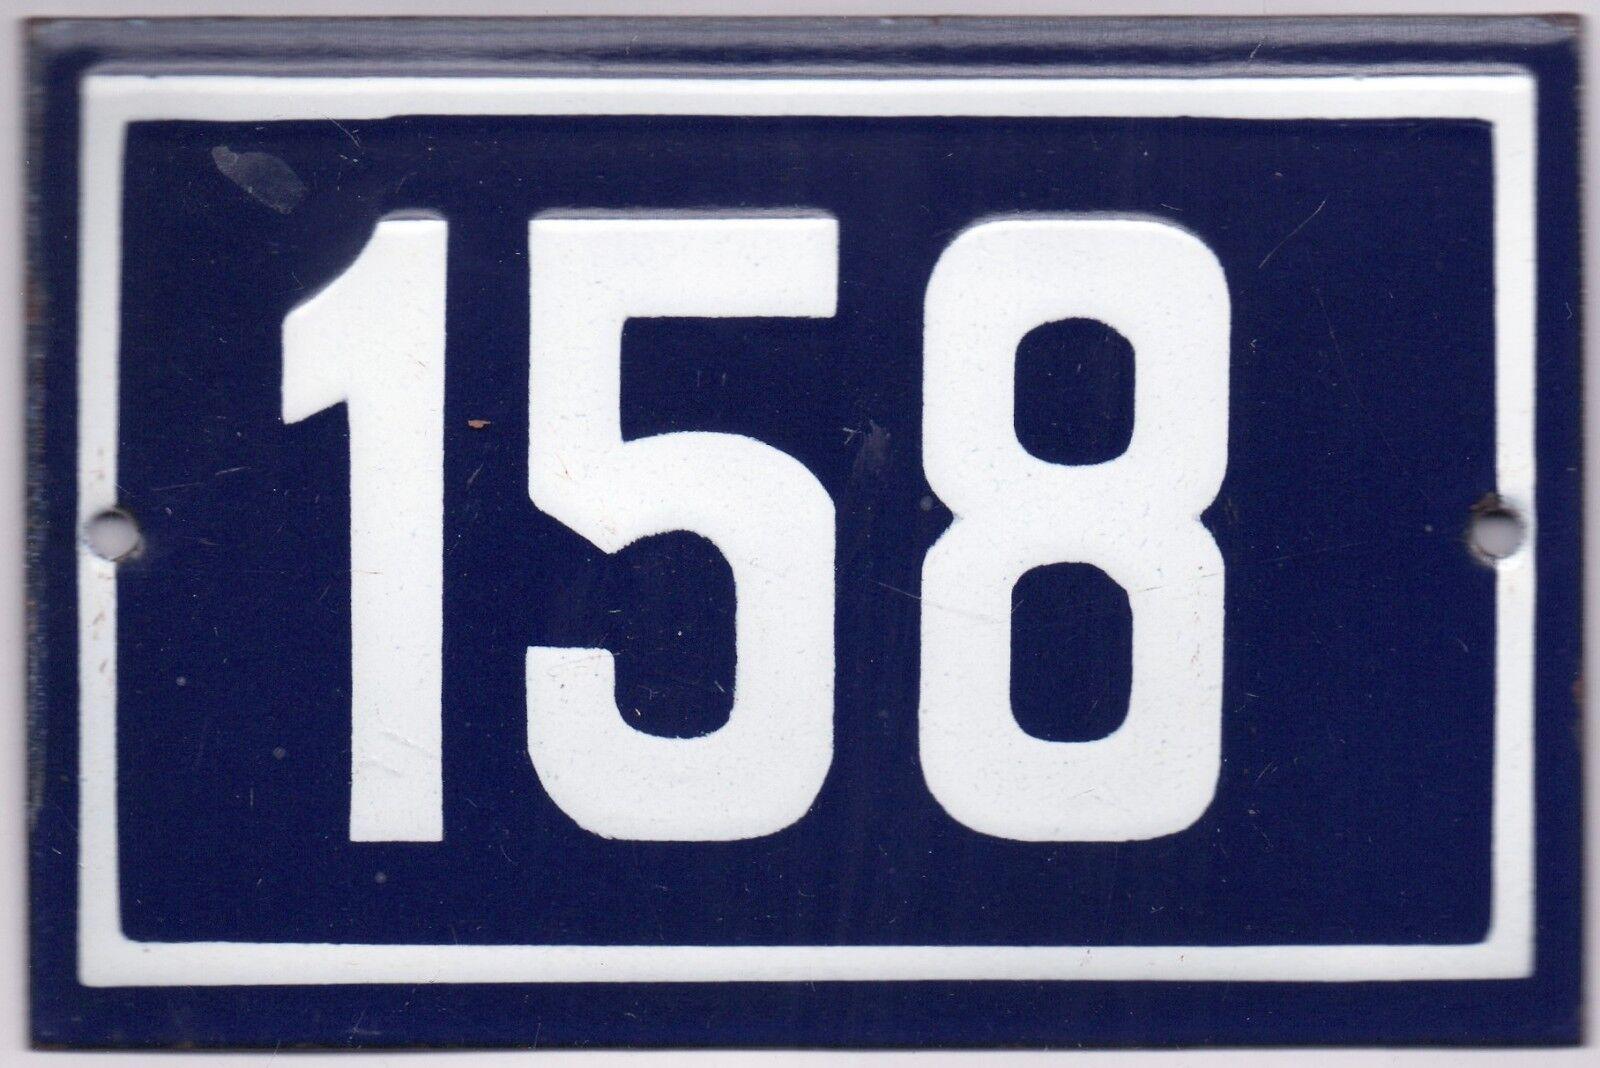 Old Blau French house number 158 door gate plate plaque enamel steel metal sign